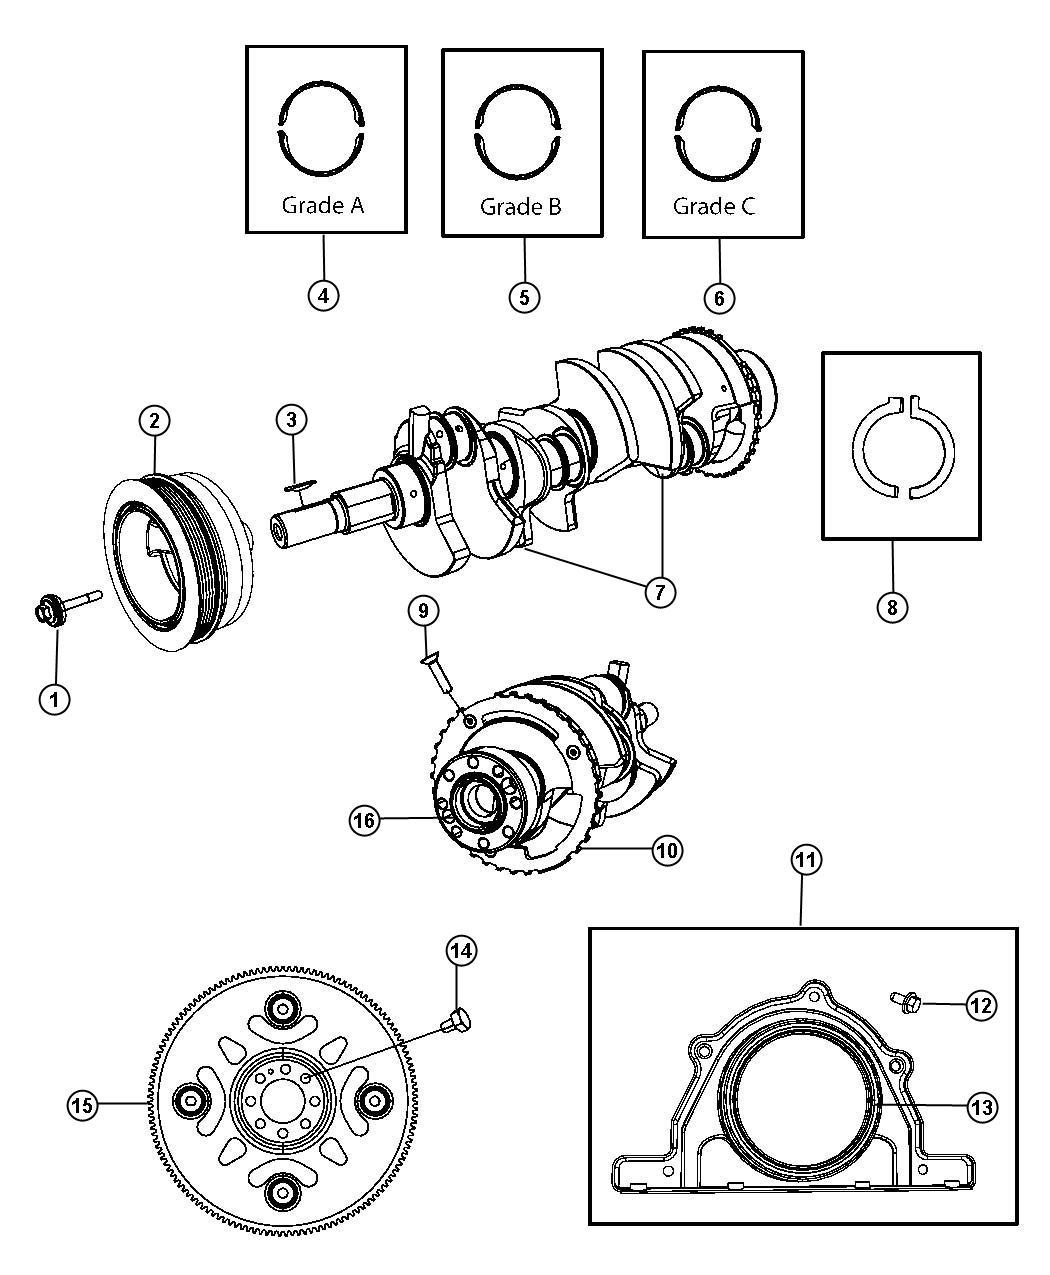 Dodge Charger Damper. Crankshaft. Bearings, flywheel, ezh